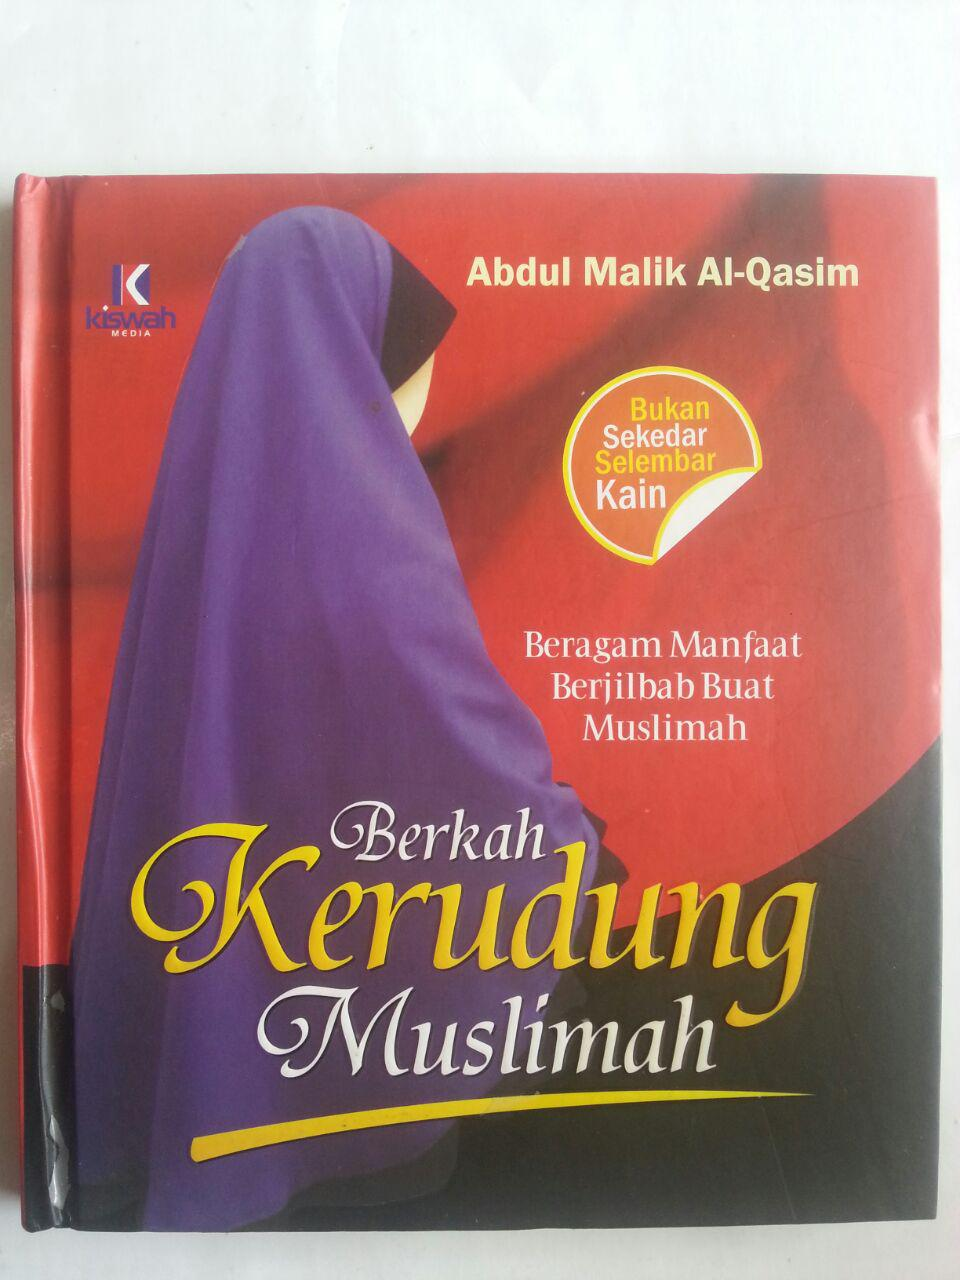 Buku Berkah Kerudung Muslimah Beragam Manfaat Berjilbab cover 2